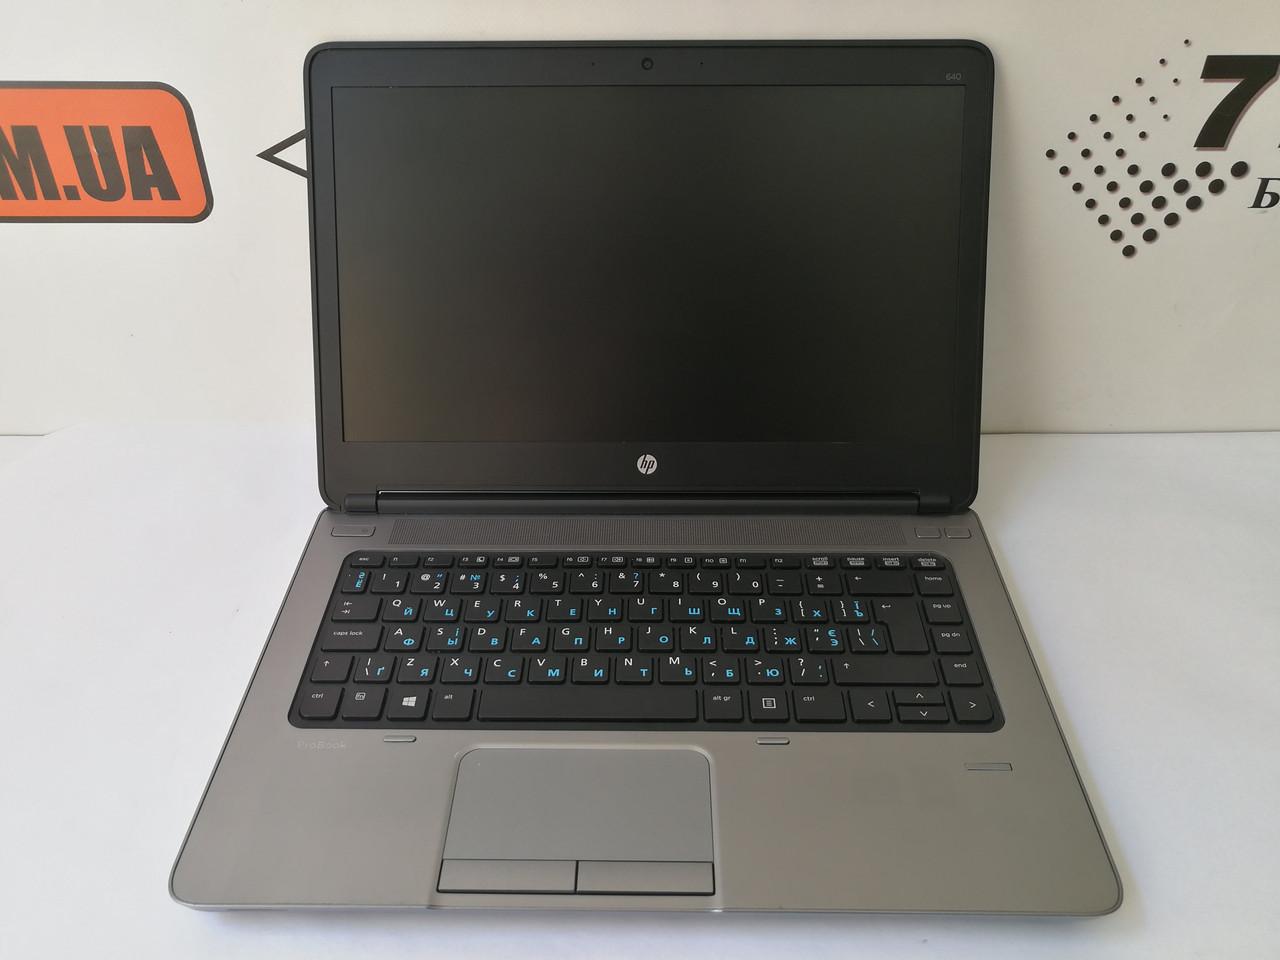 "Ноутбук HP EliteBook 640, 14"", Intel Core i5-4210M 3.2GHz, RAM 4ГБ, HDD 320ГБ"